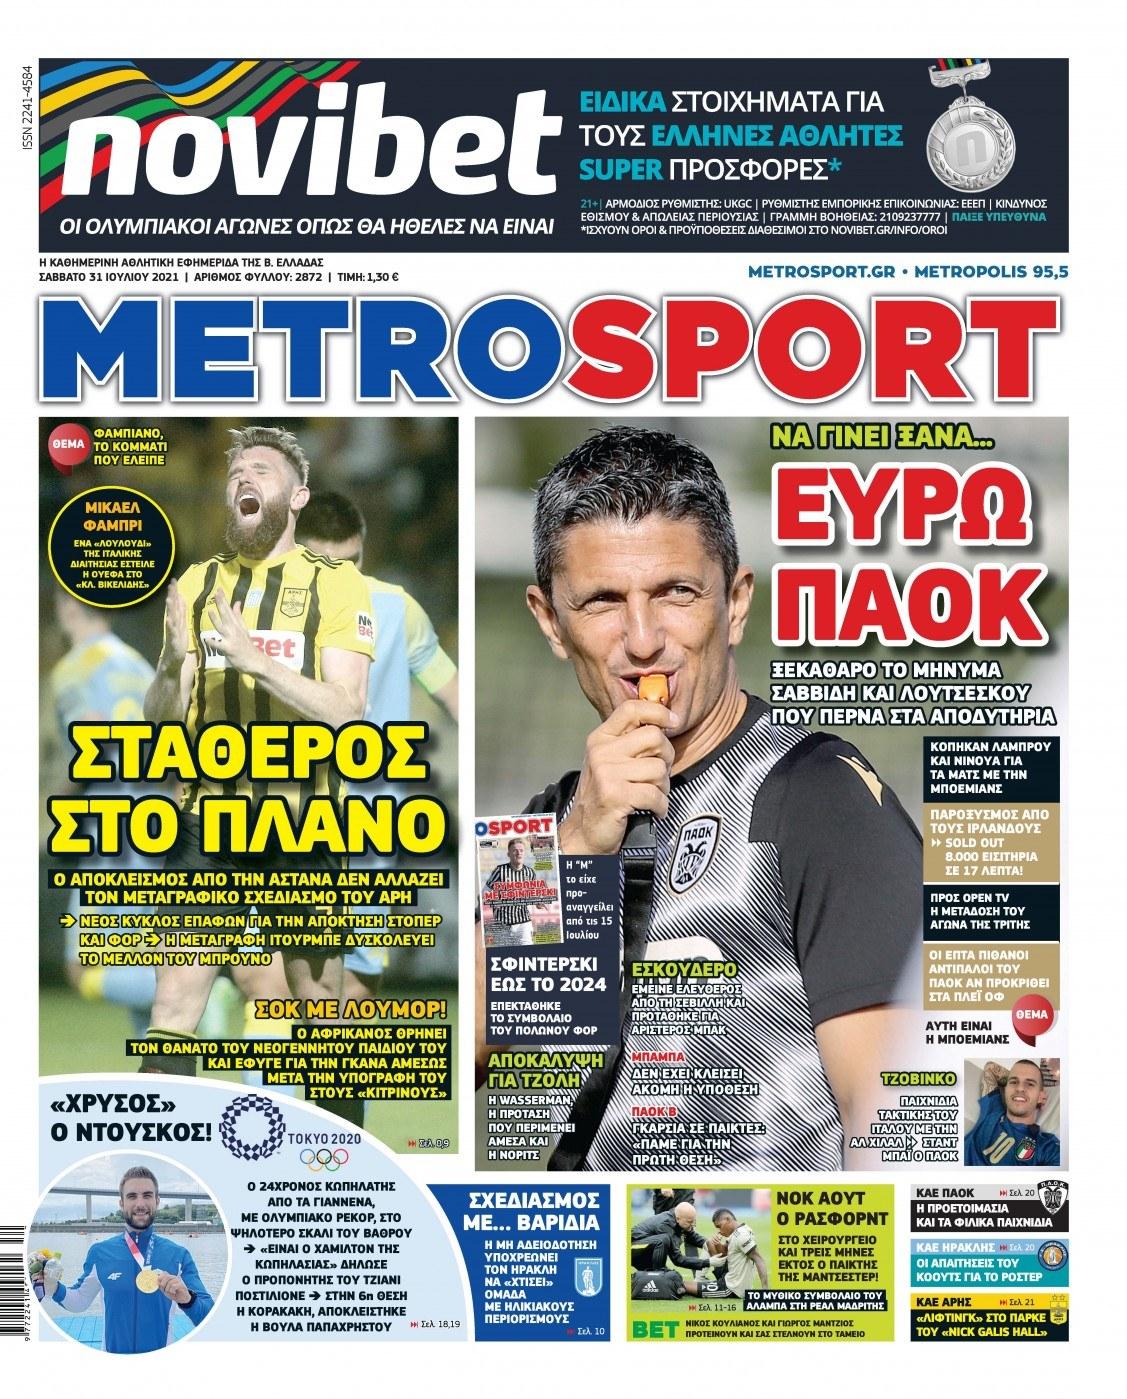 Metrosport 31.7